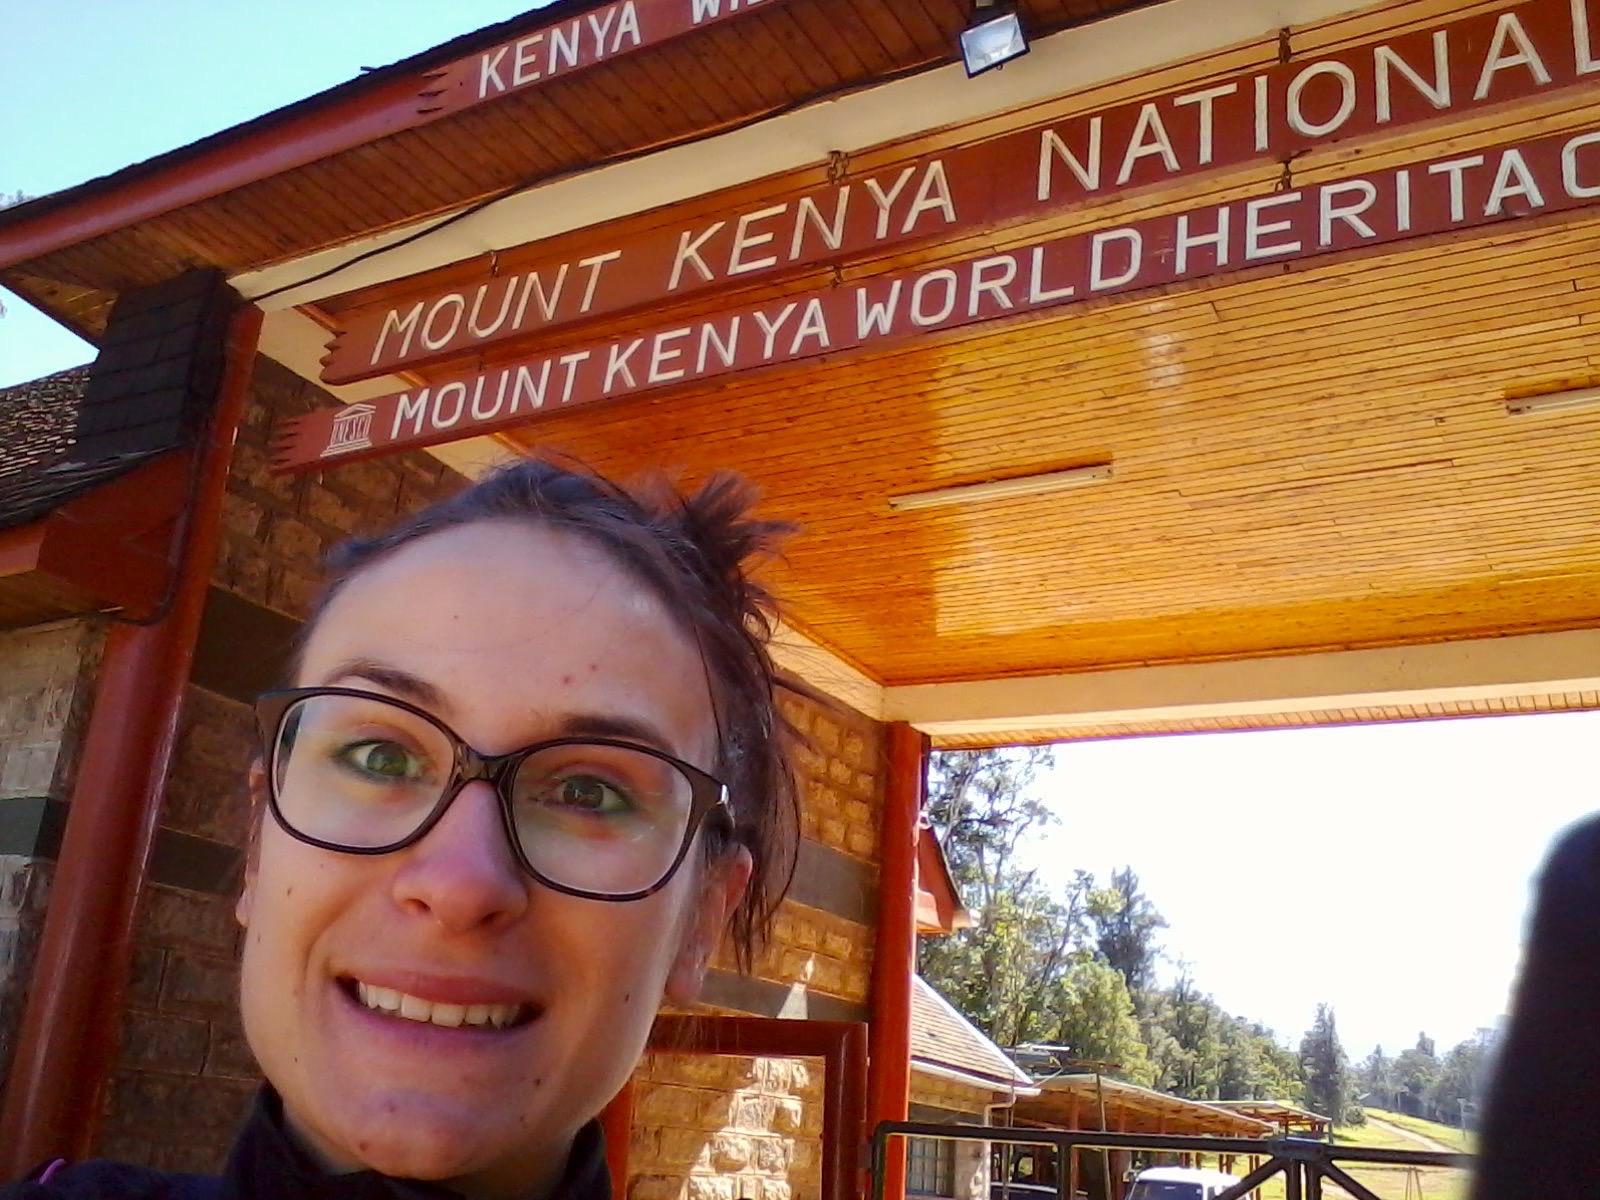 Enfin arrivée – Naromuru gate